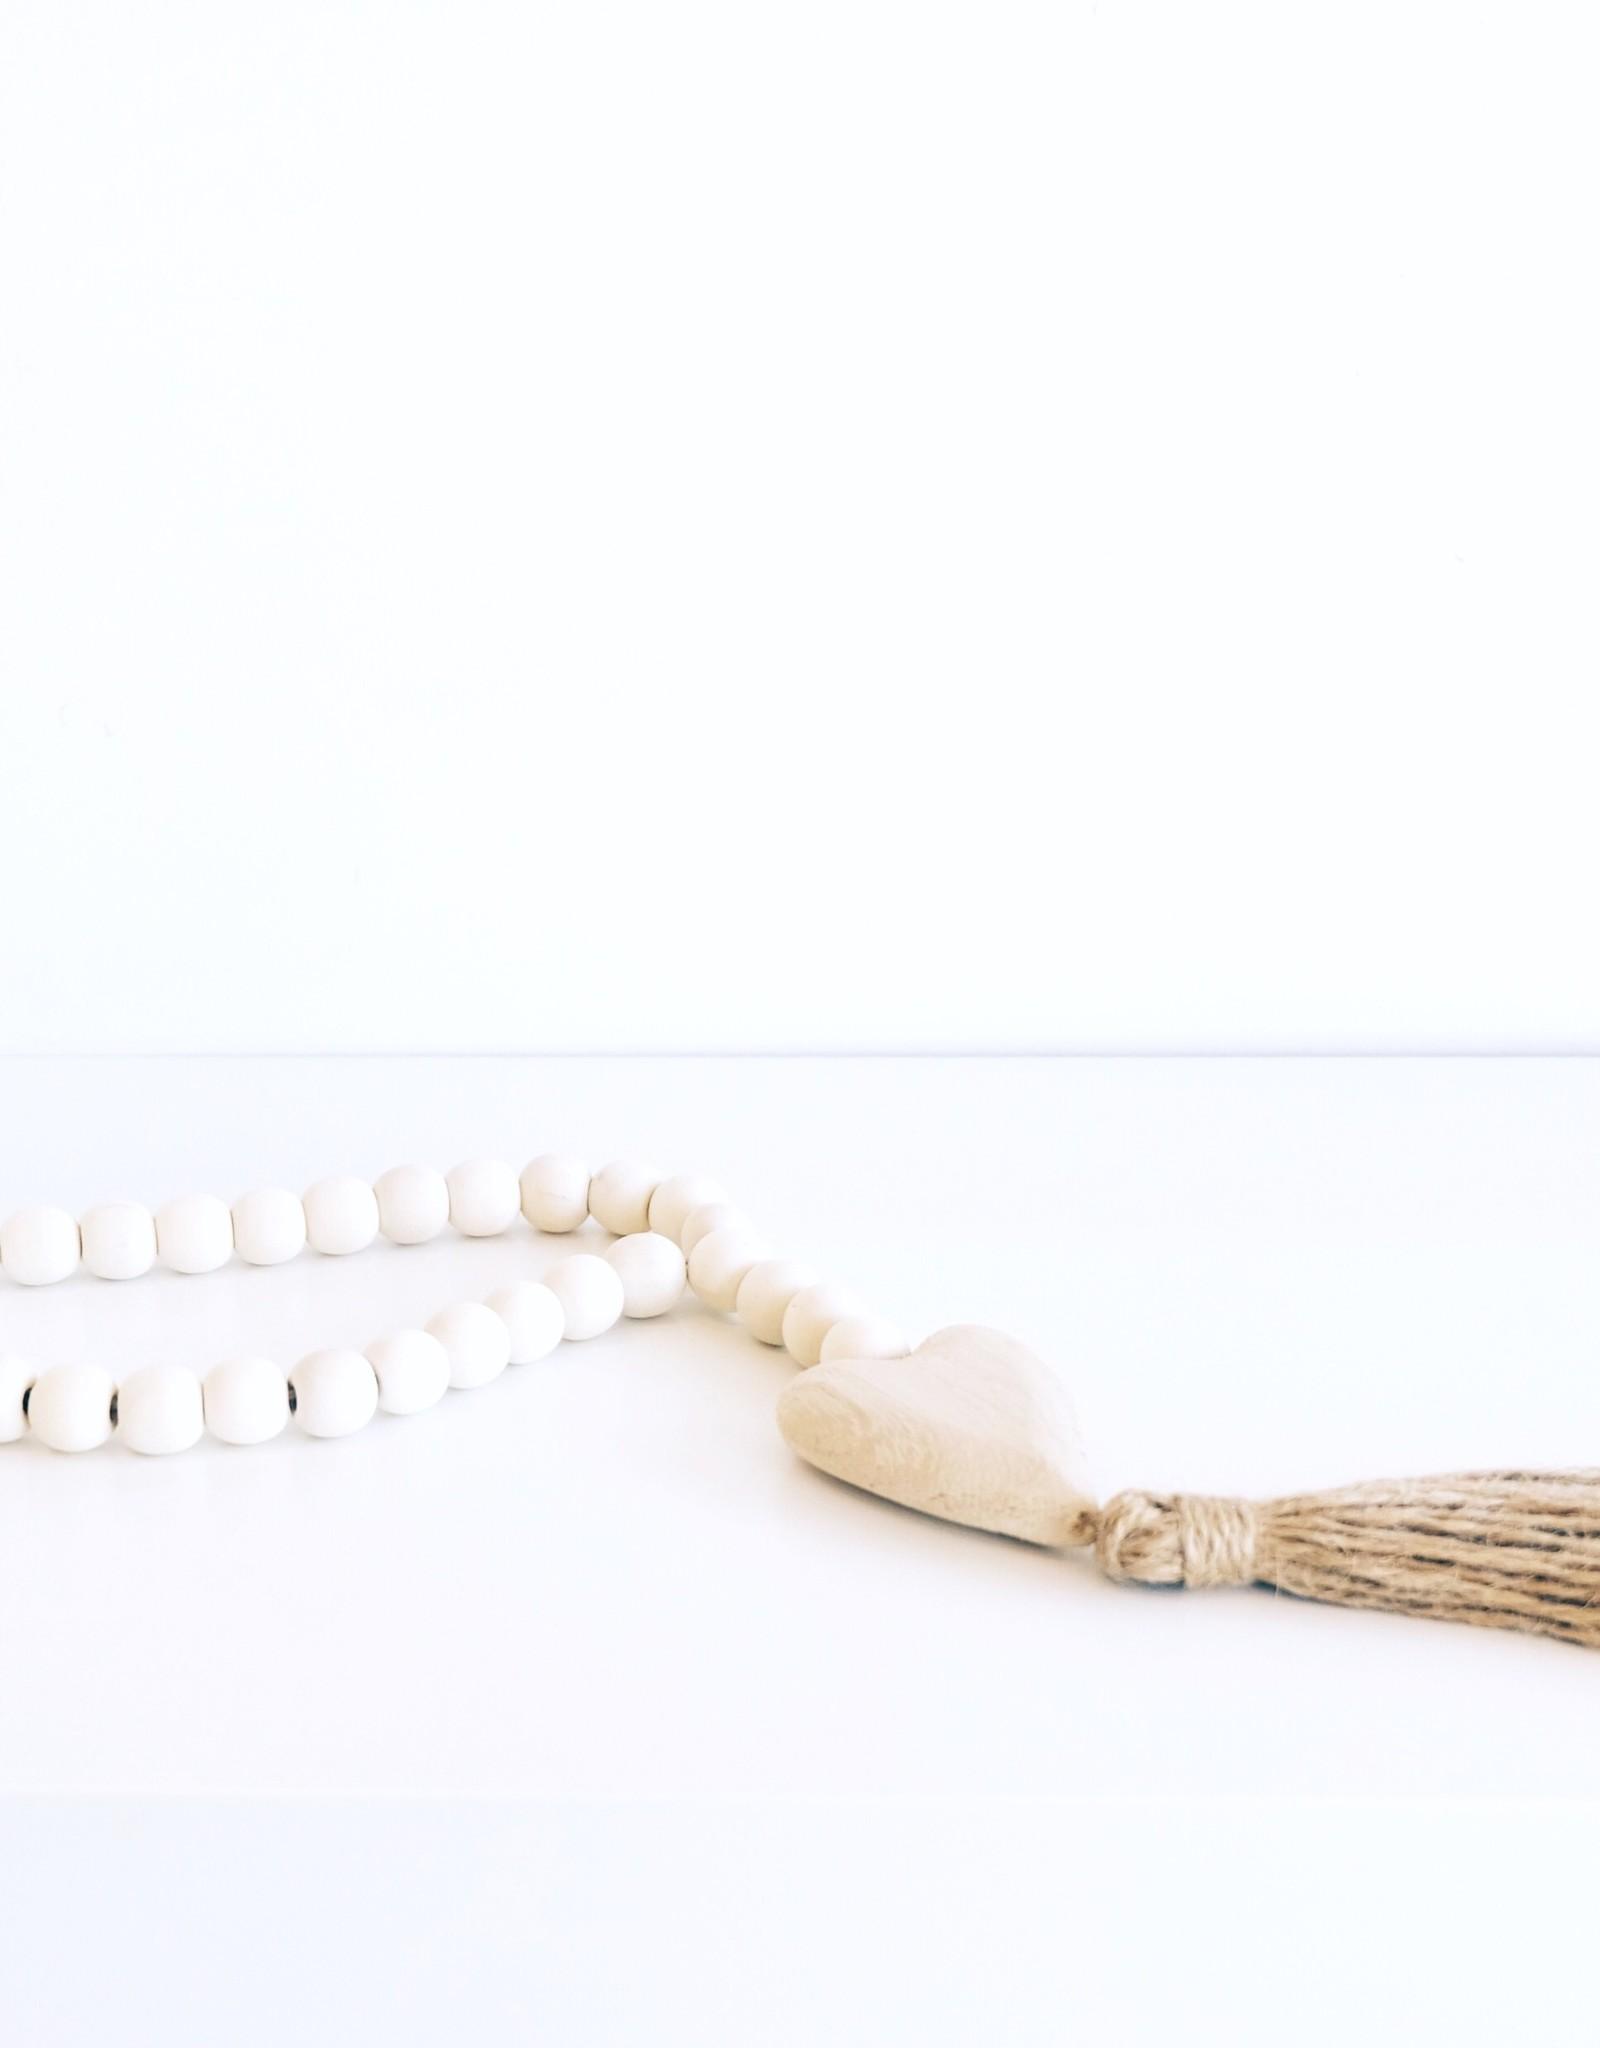 Paulownia Wood Beads with Heart Pendant